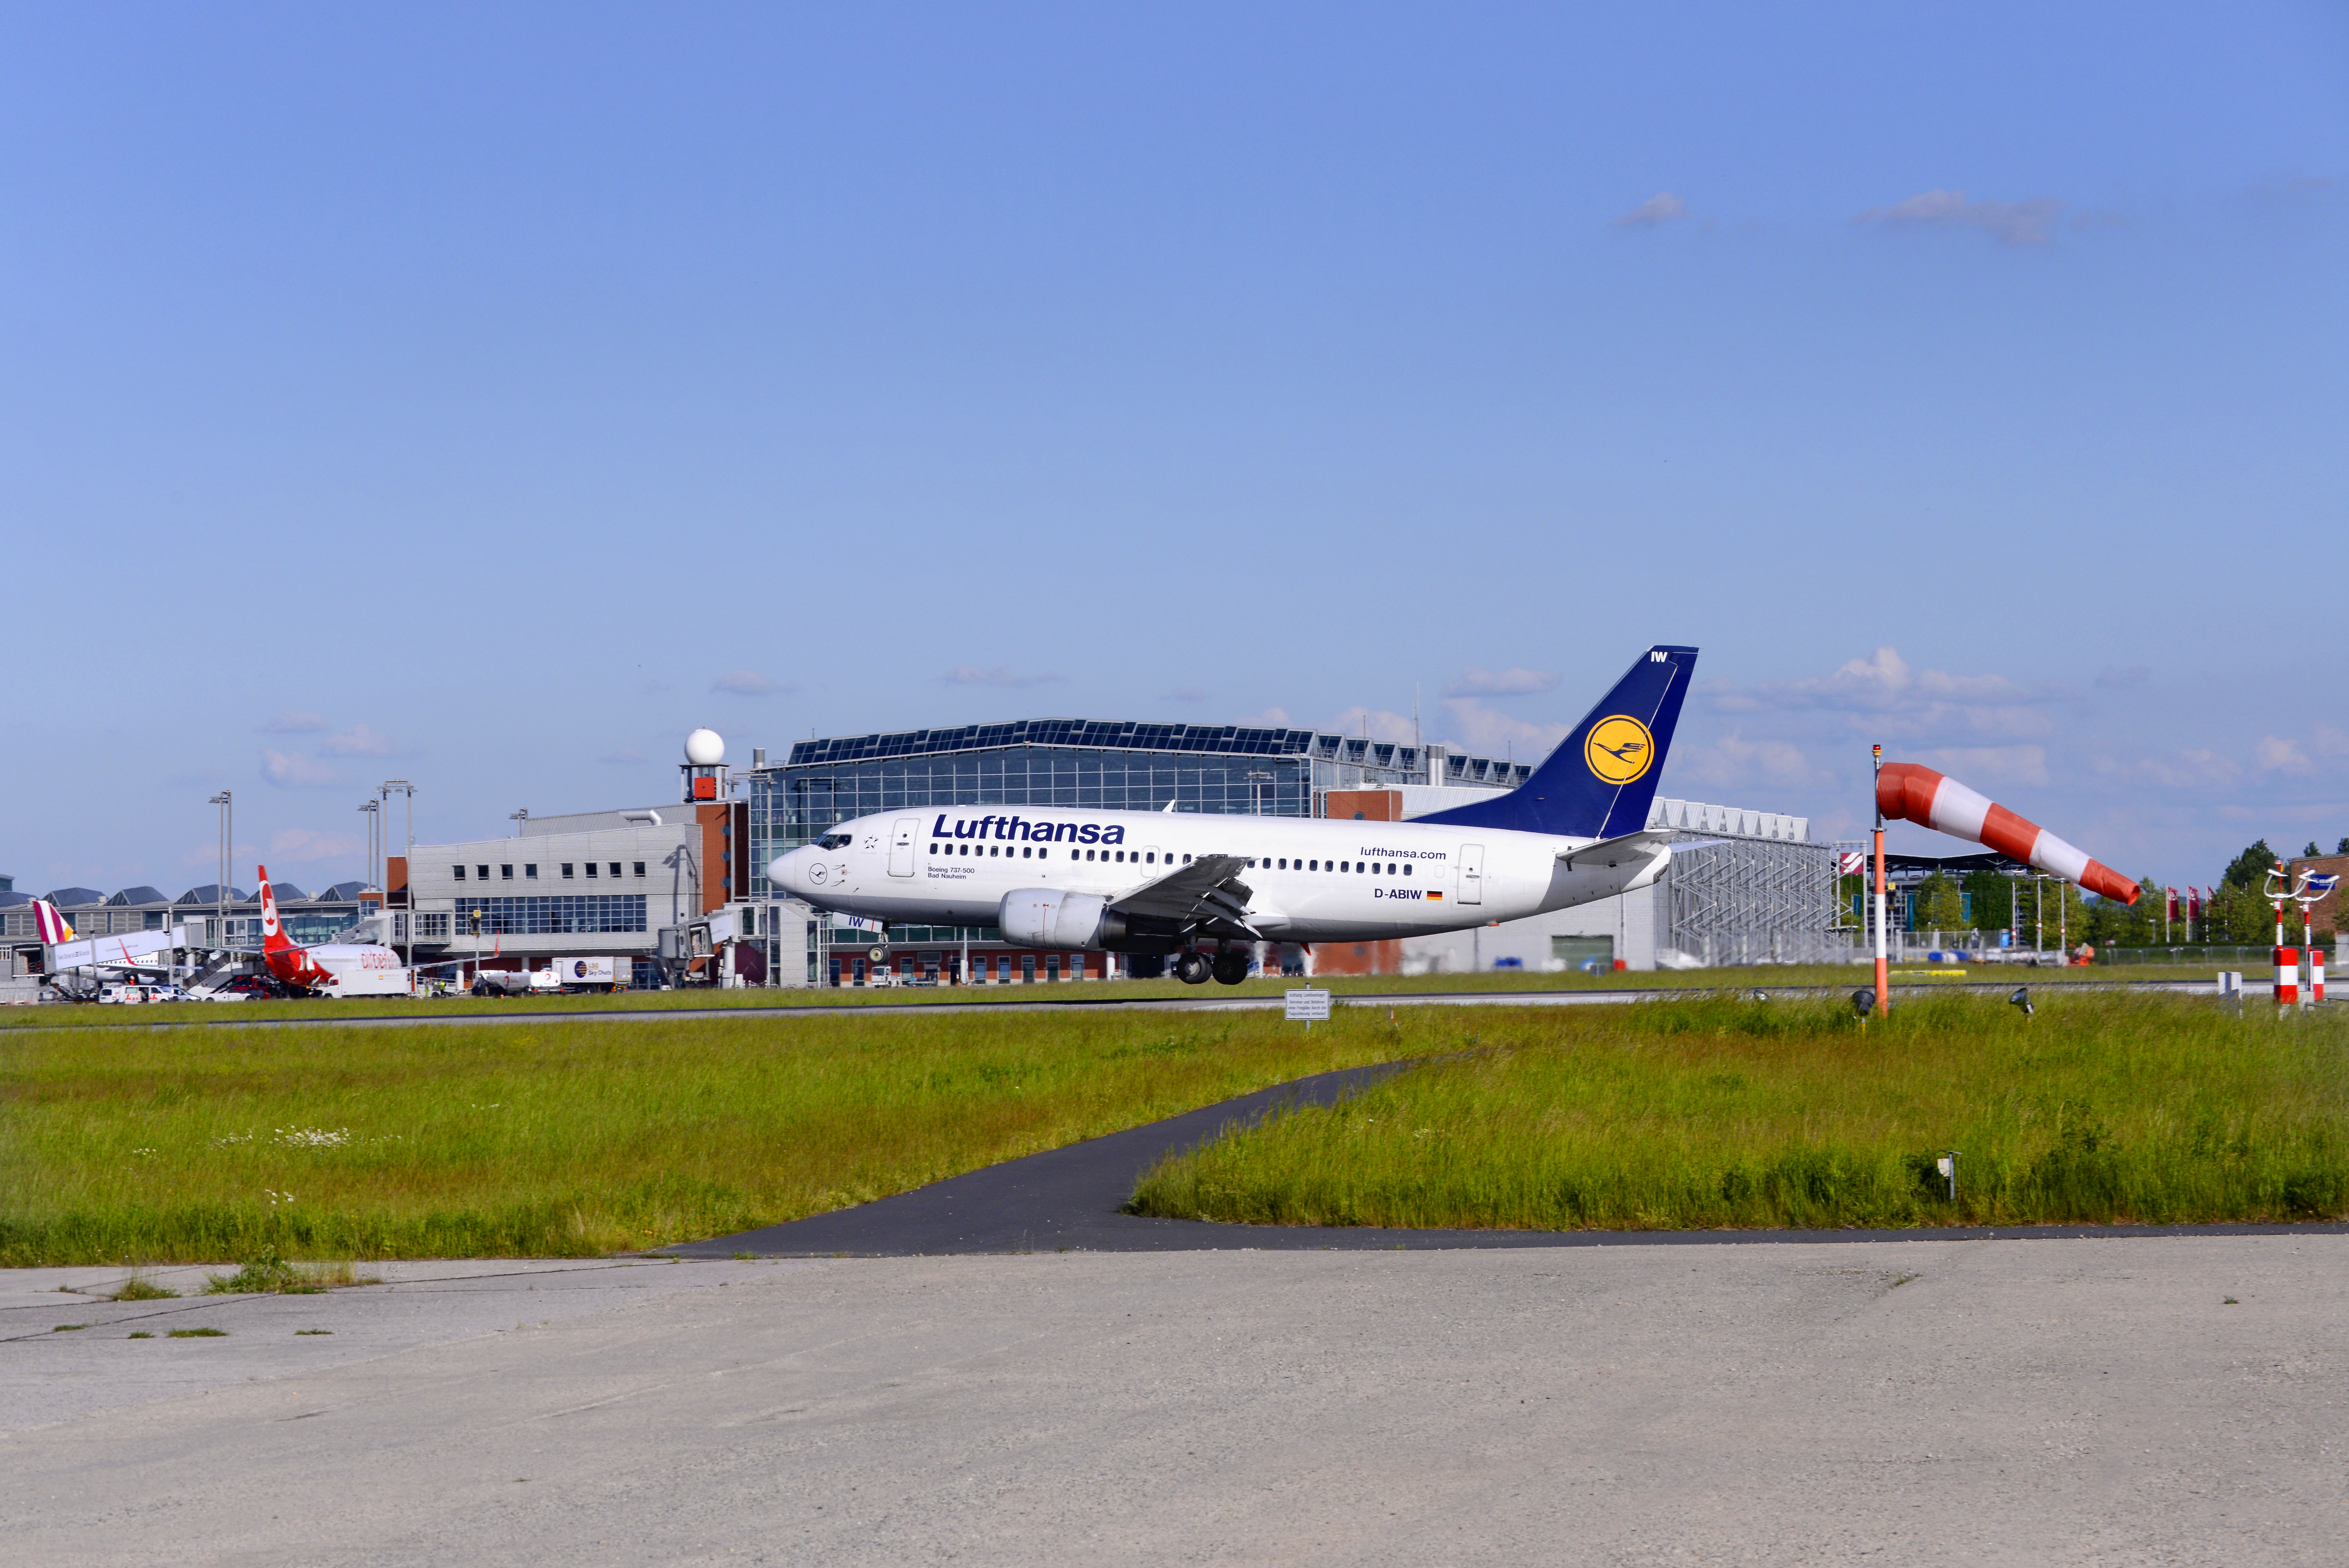 © Flughafen Dresden GmbH, Michael Weimer